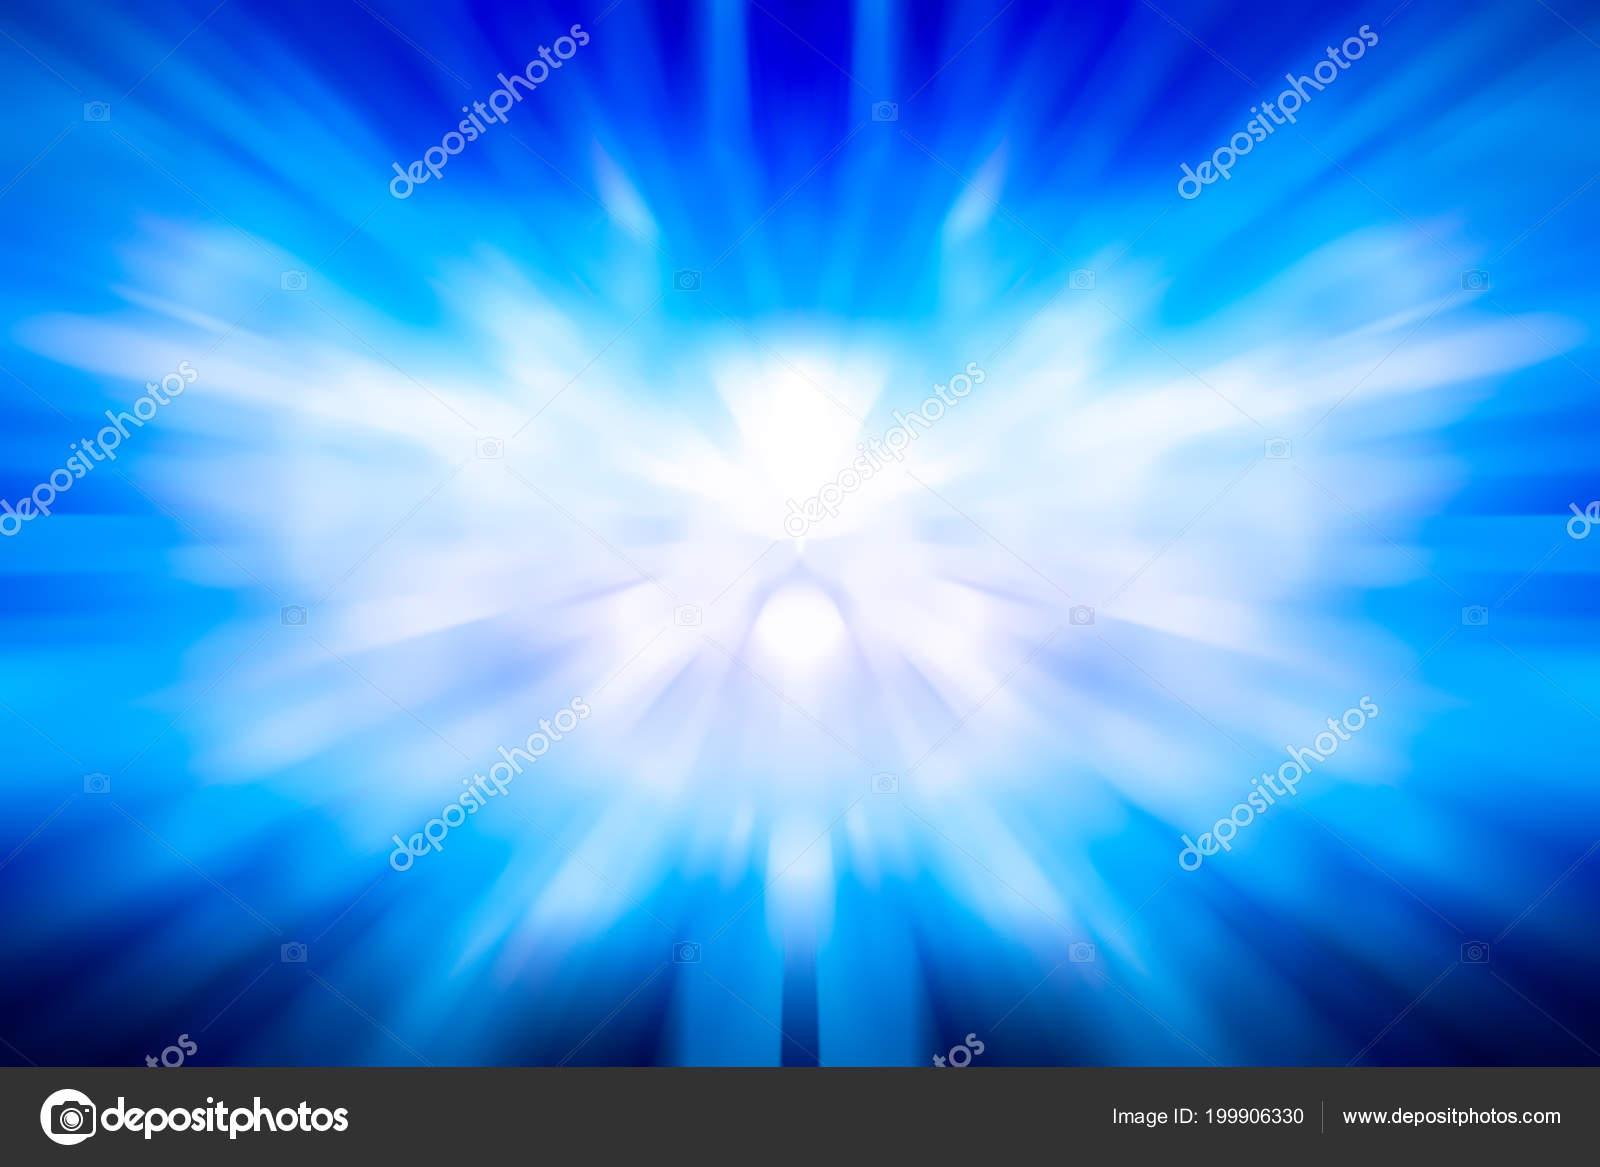 Light Blue Gradient Background Blue Radial Gradient Effect